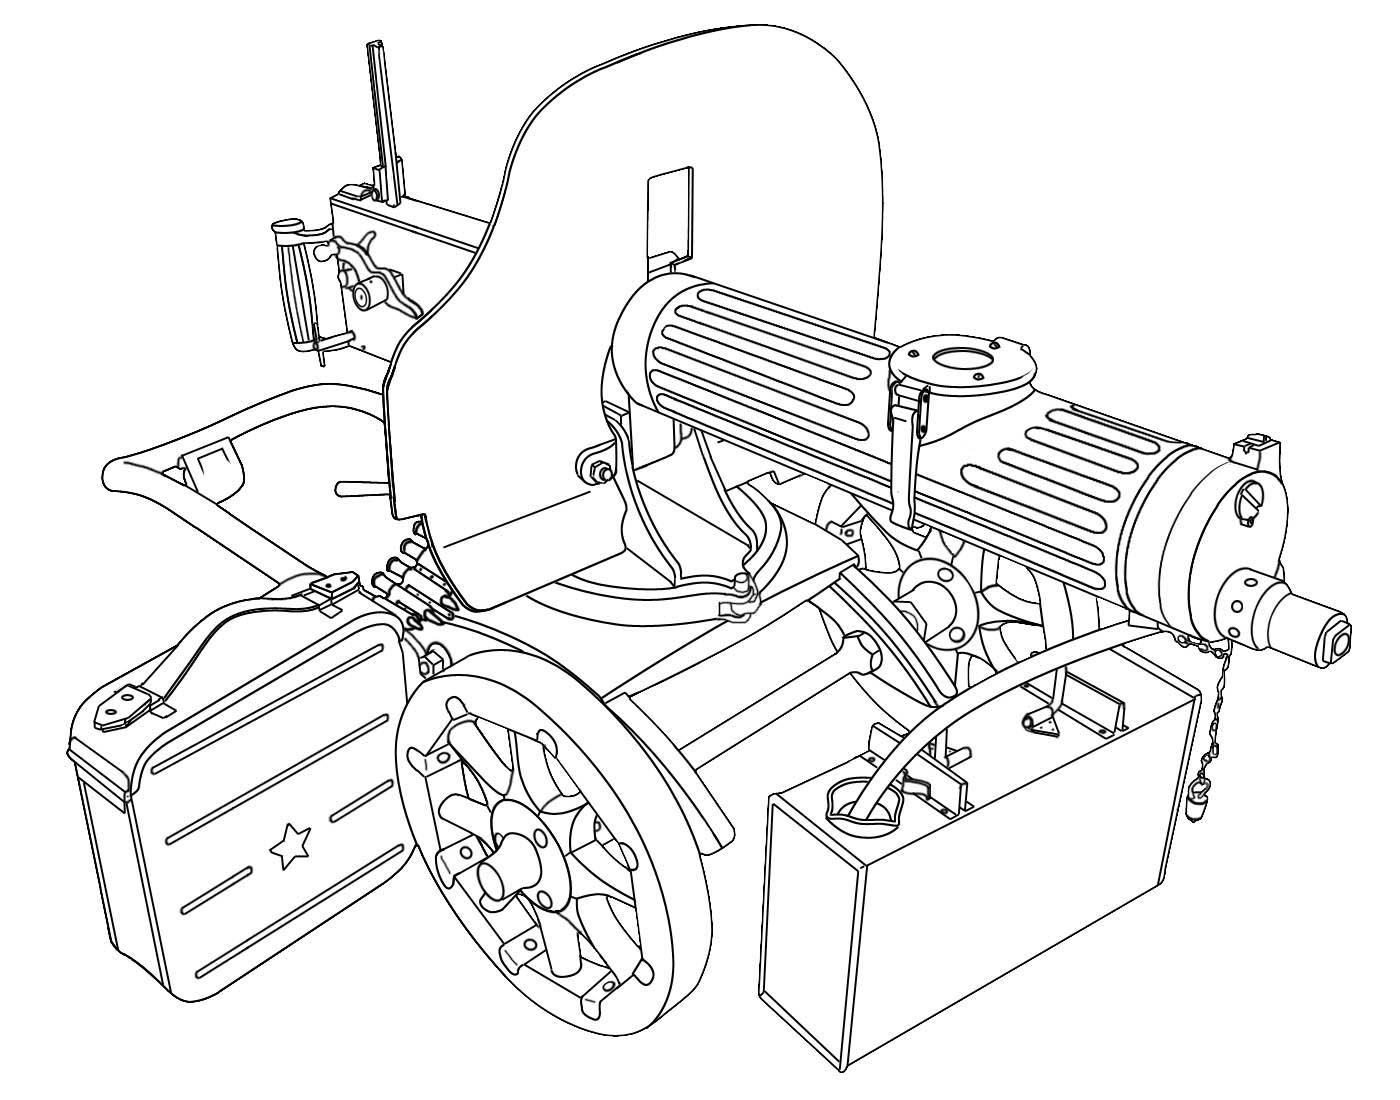 Maxim Gun Blueprint